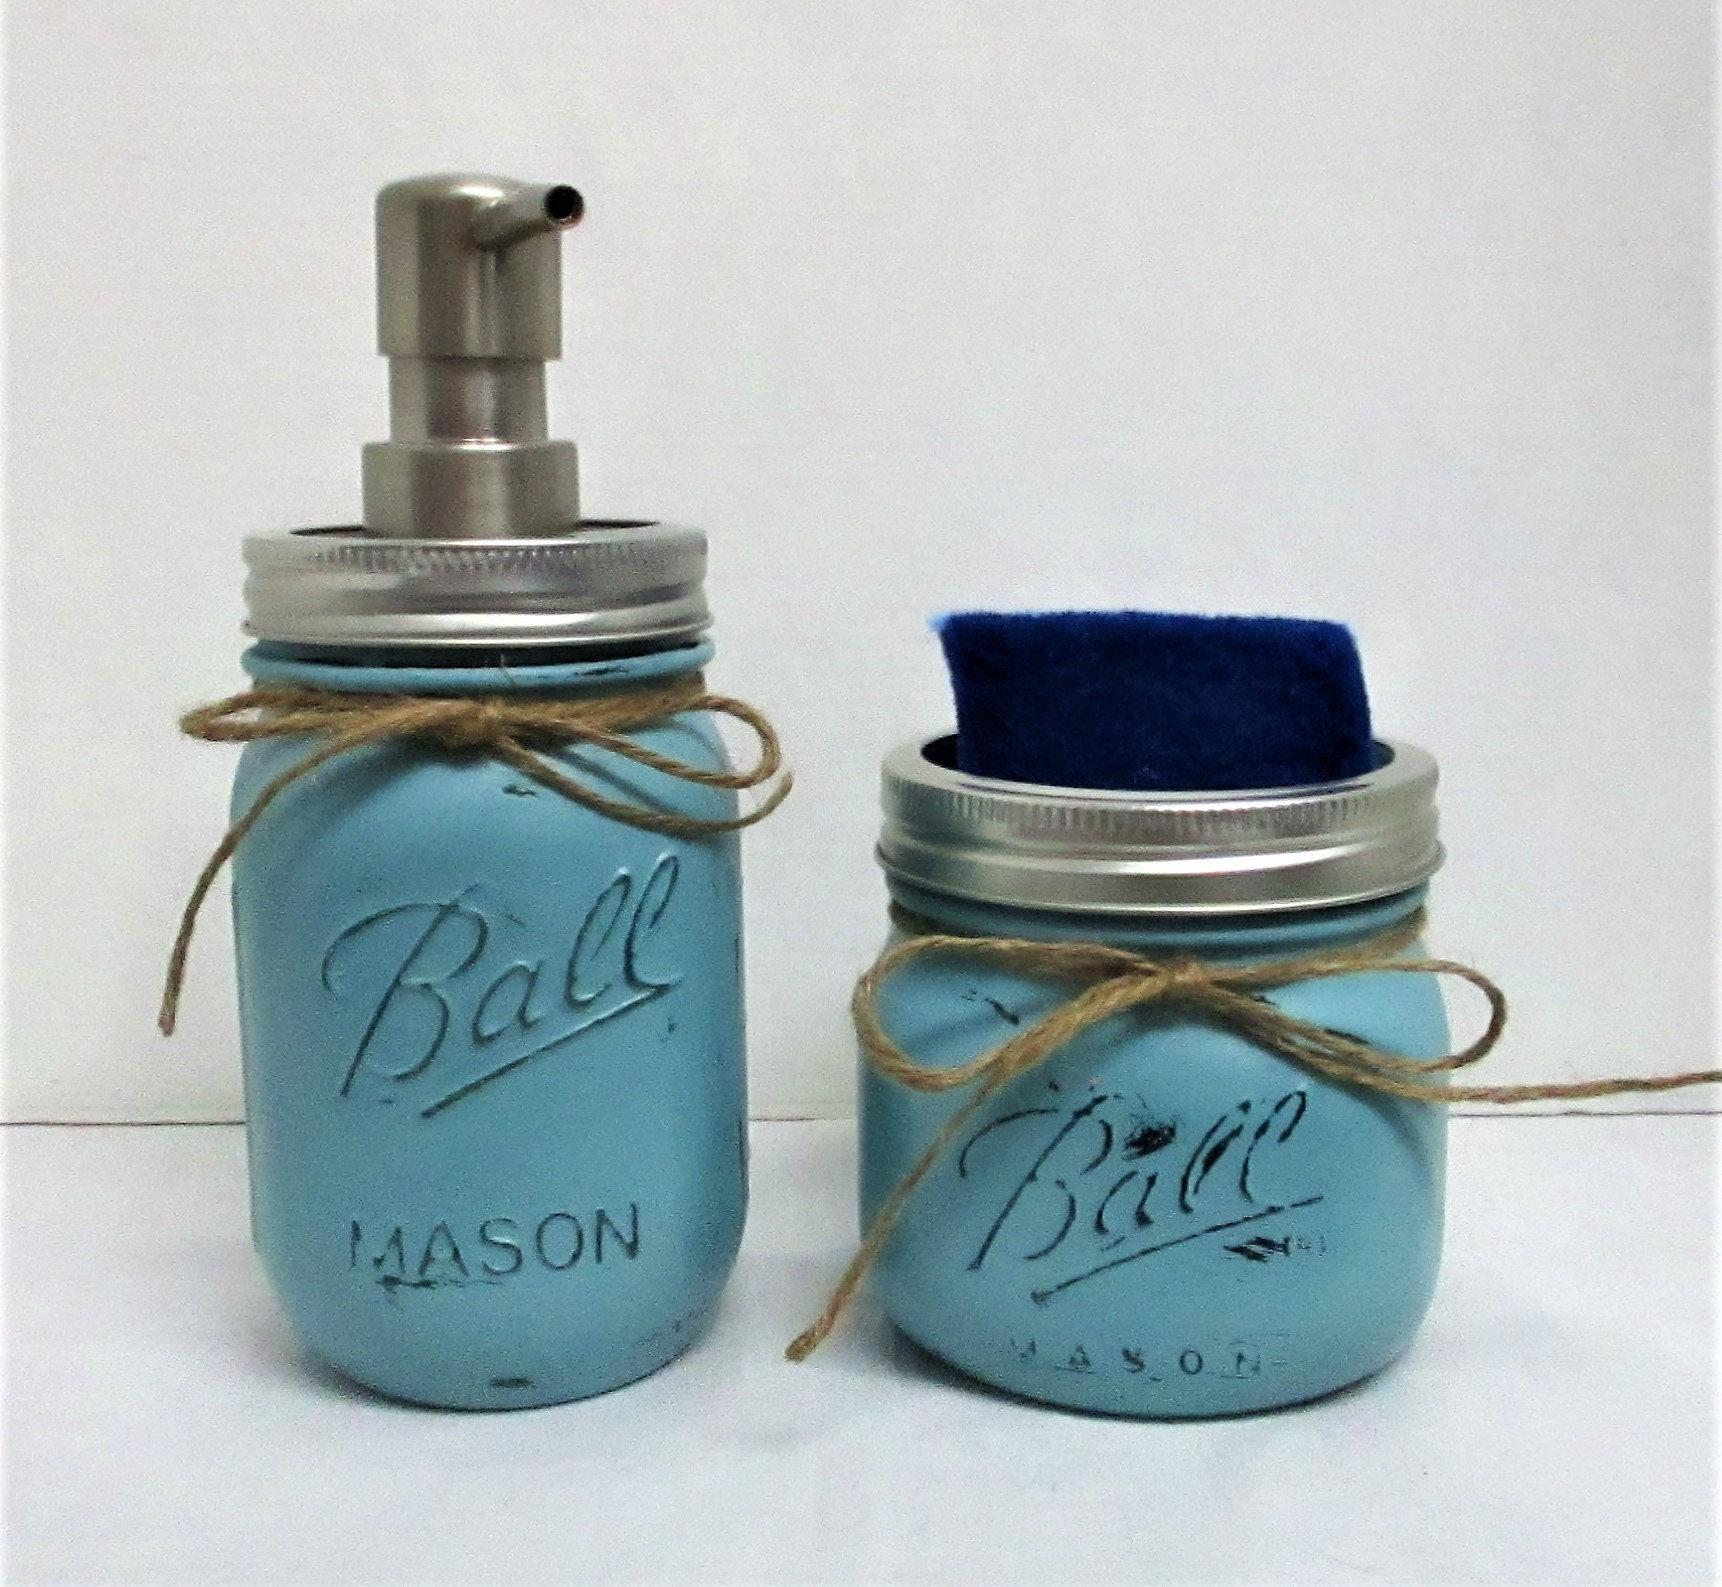 Mason jar kitchen set soap dispenser sponge holder rustic kitchen farmhouse decor country chic decor rustic decor mason jars